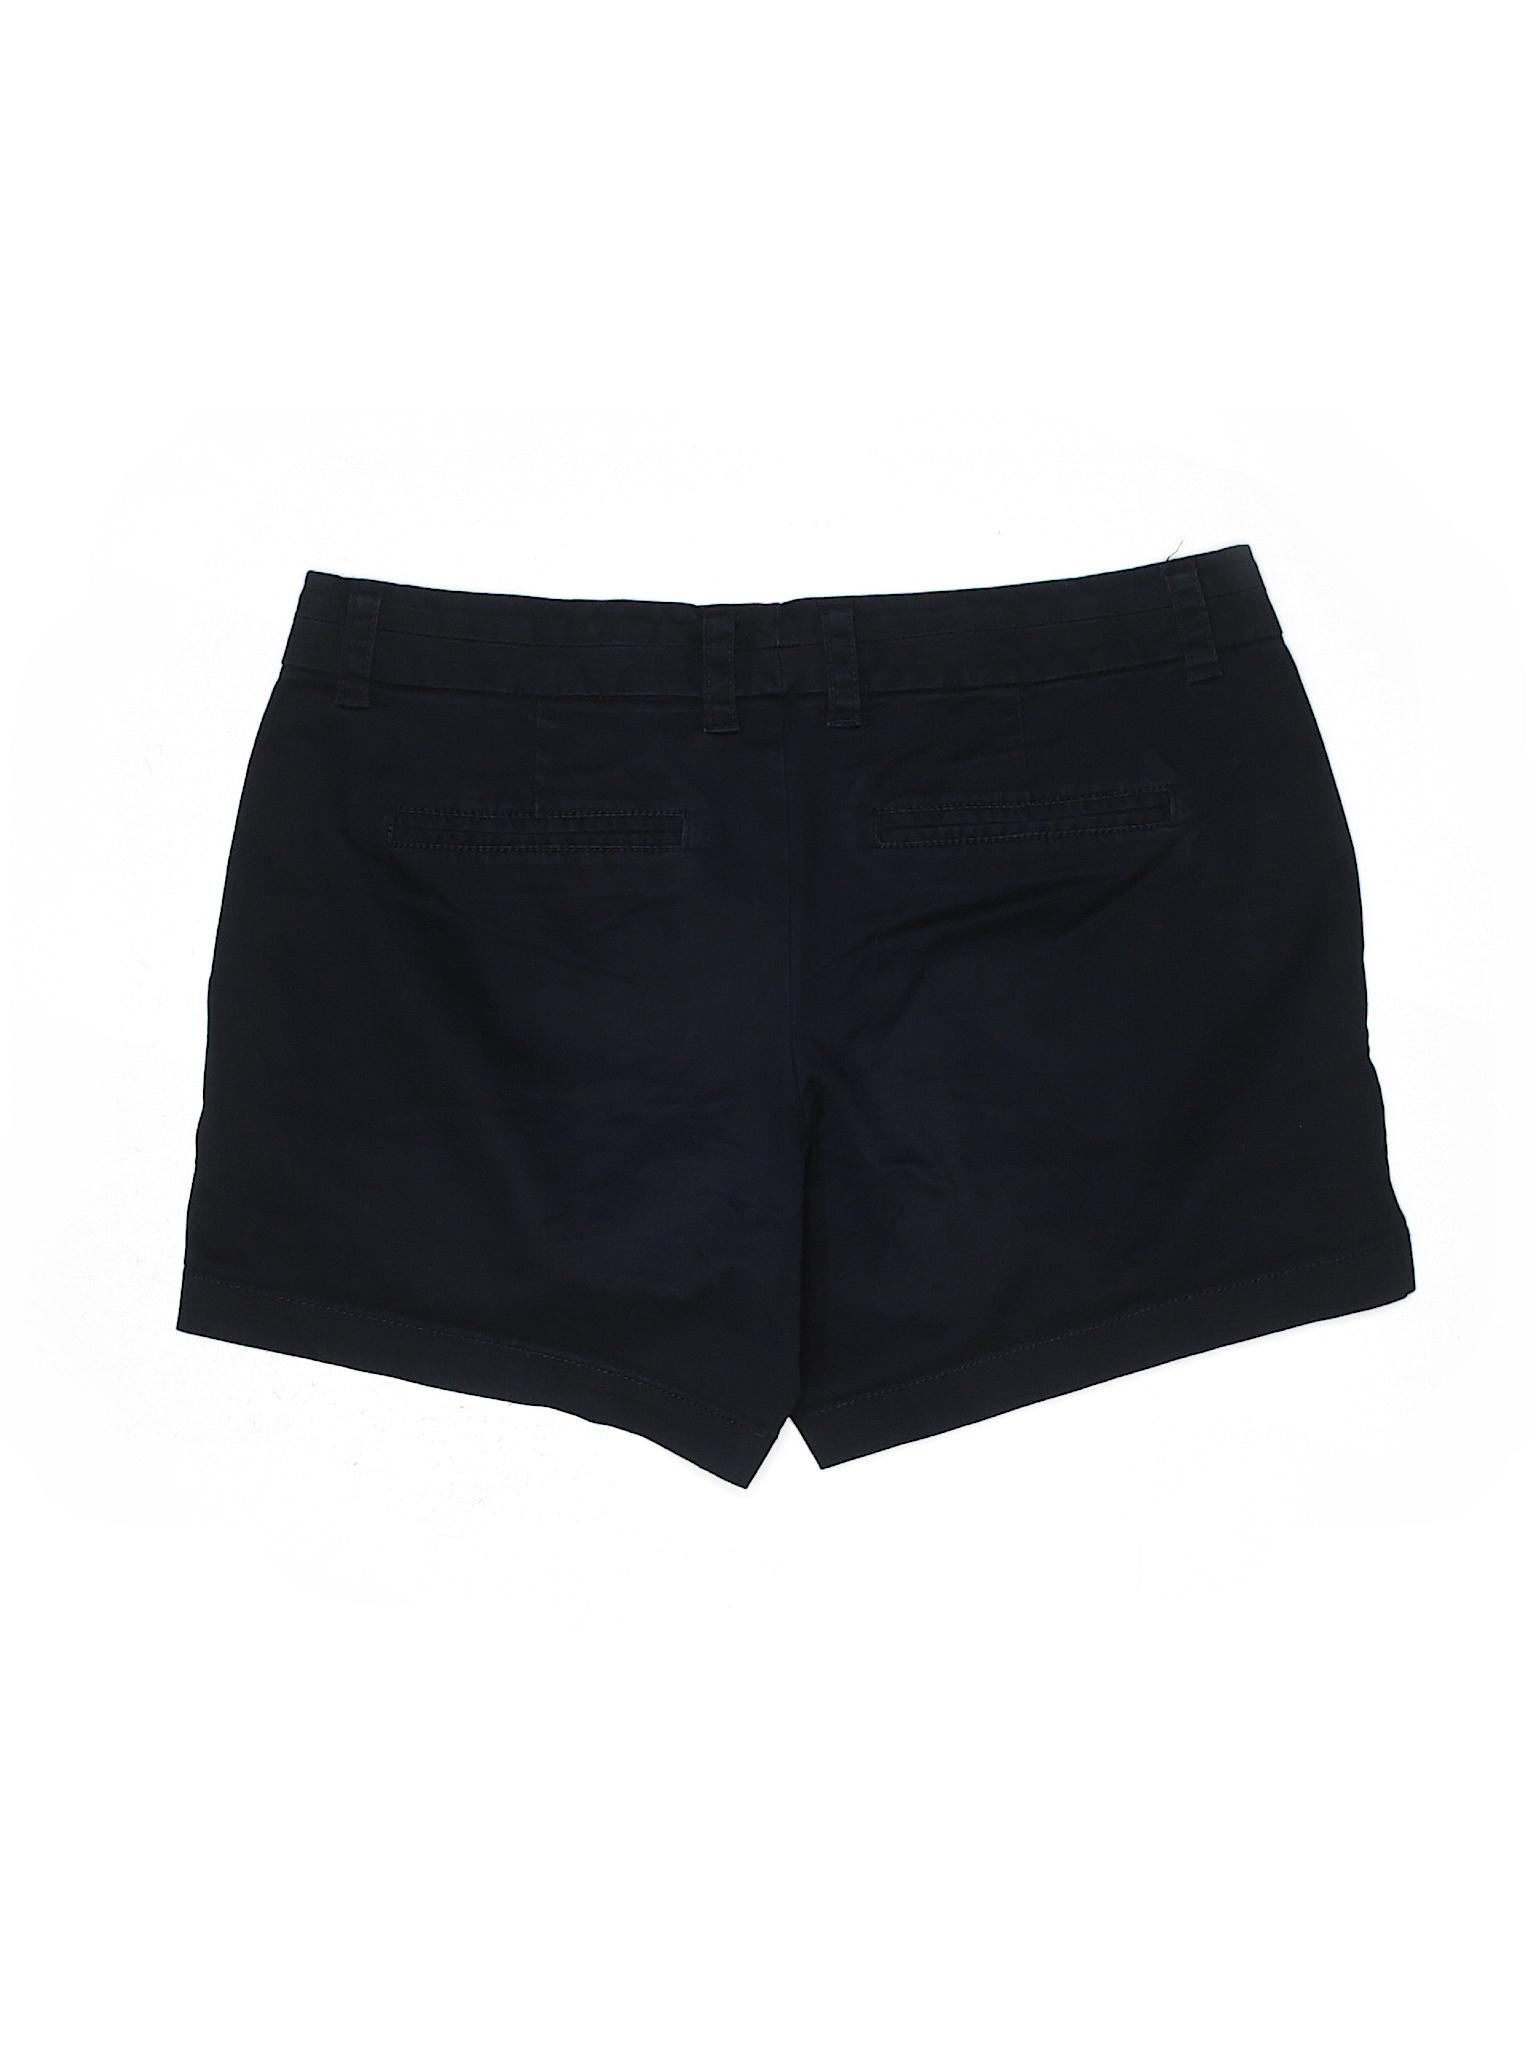 Ivy Khaki Boutique amp; leisure Crown Shorts qwIgta